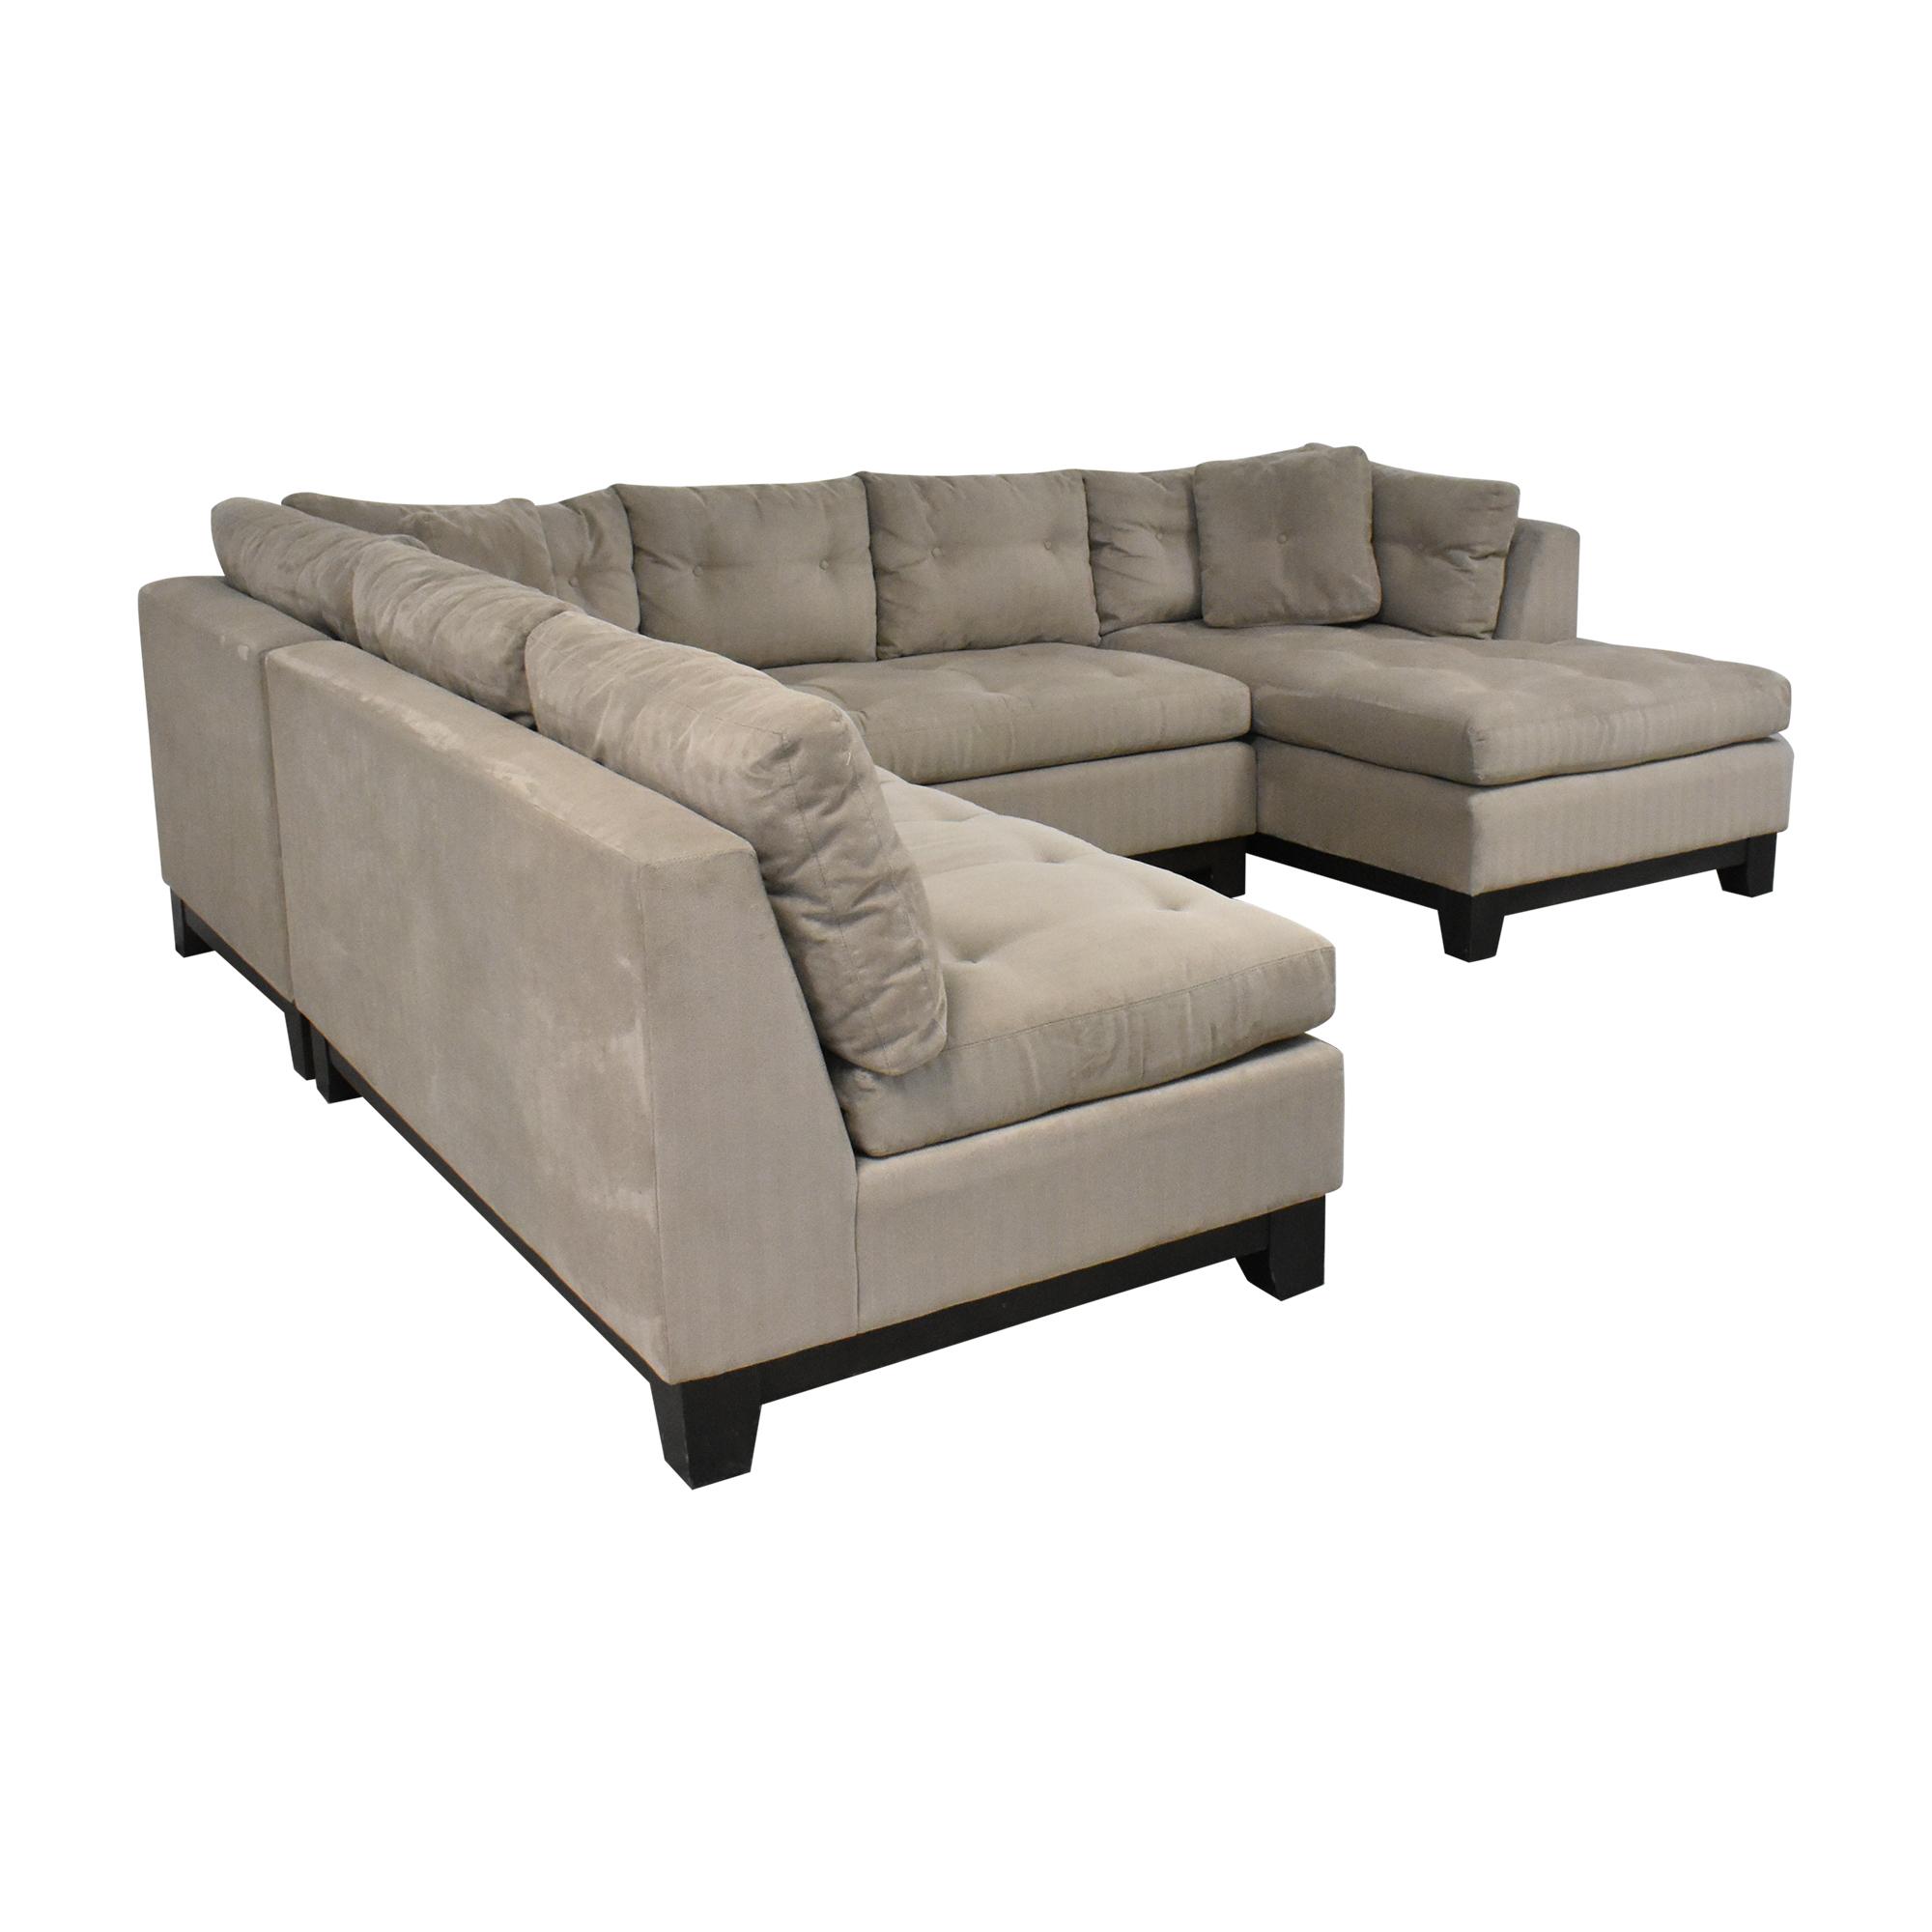 Arhaus Arhaus Camden Collection Chaise Sectional Sofa price